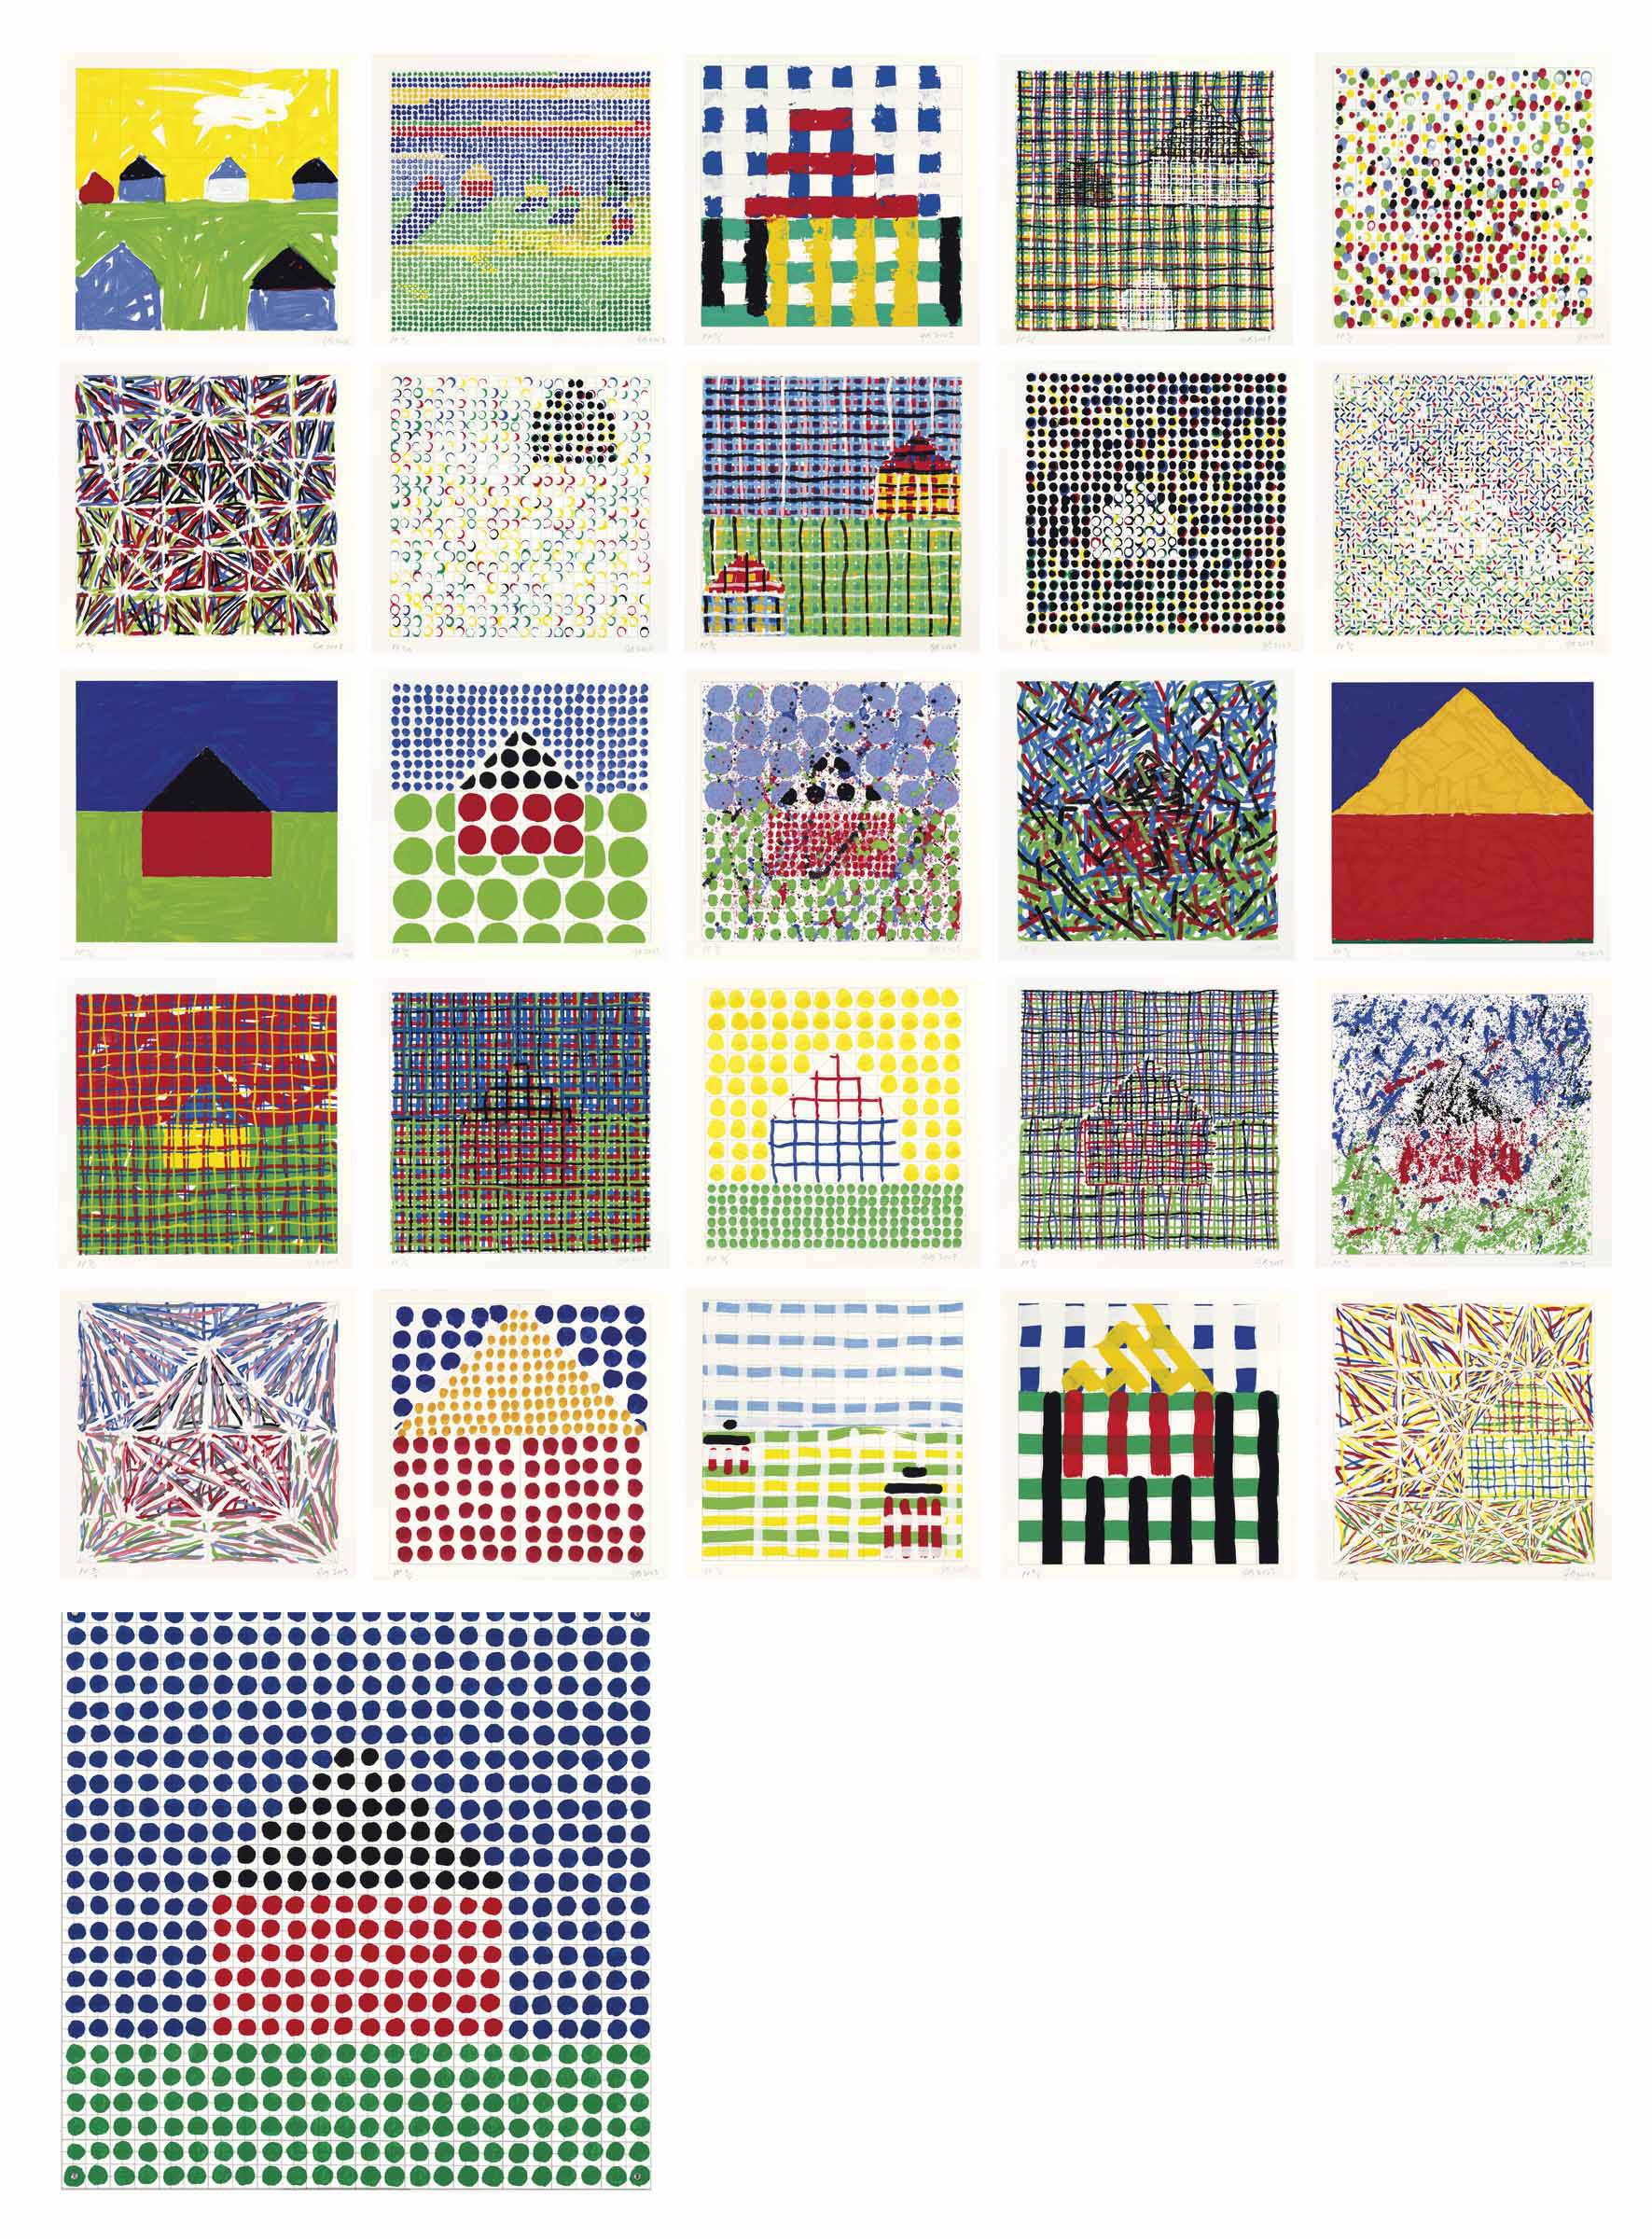 House, Brand X Editions Ltd., New York, 2003